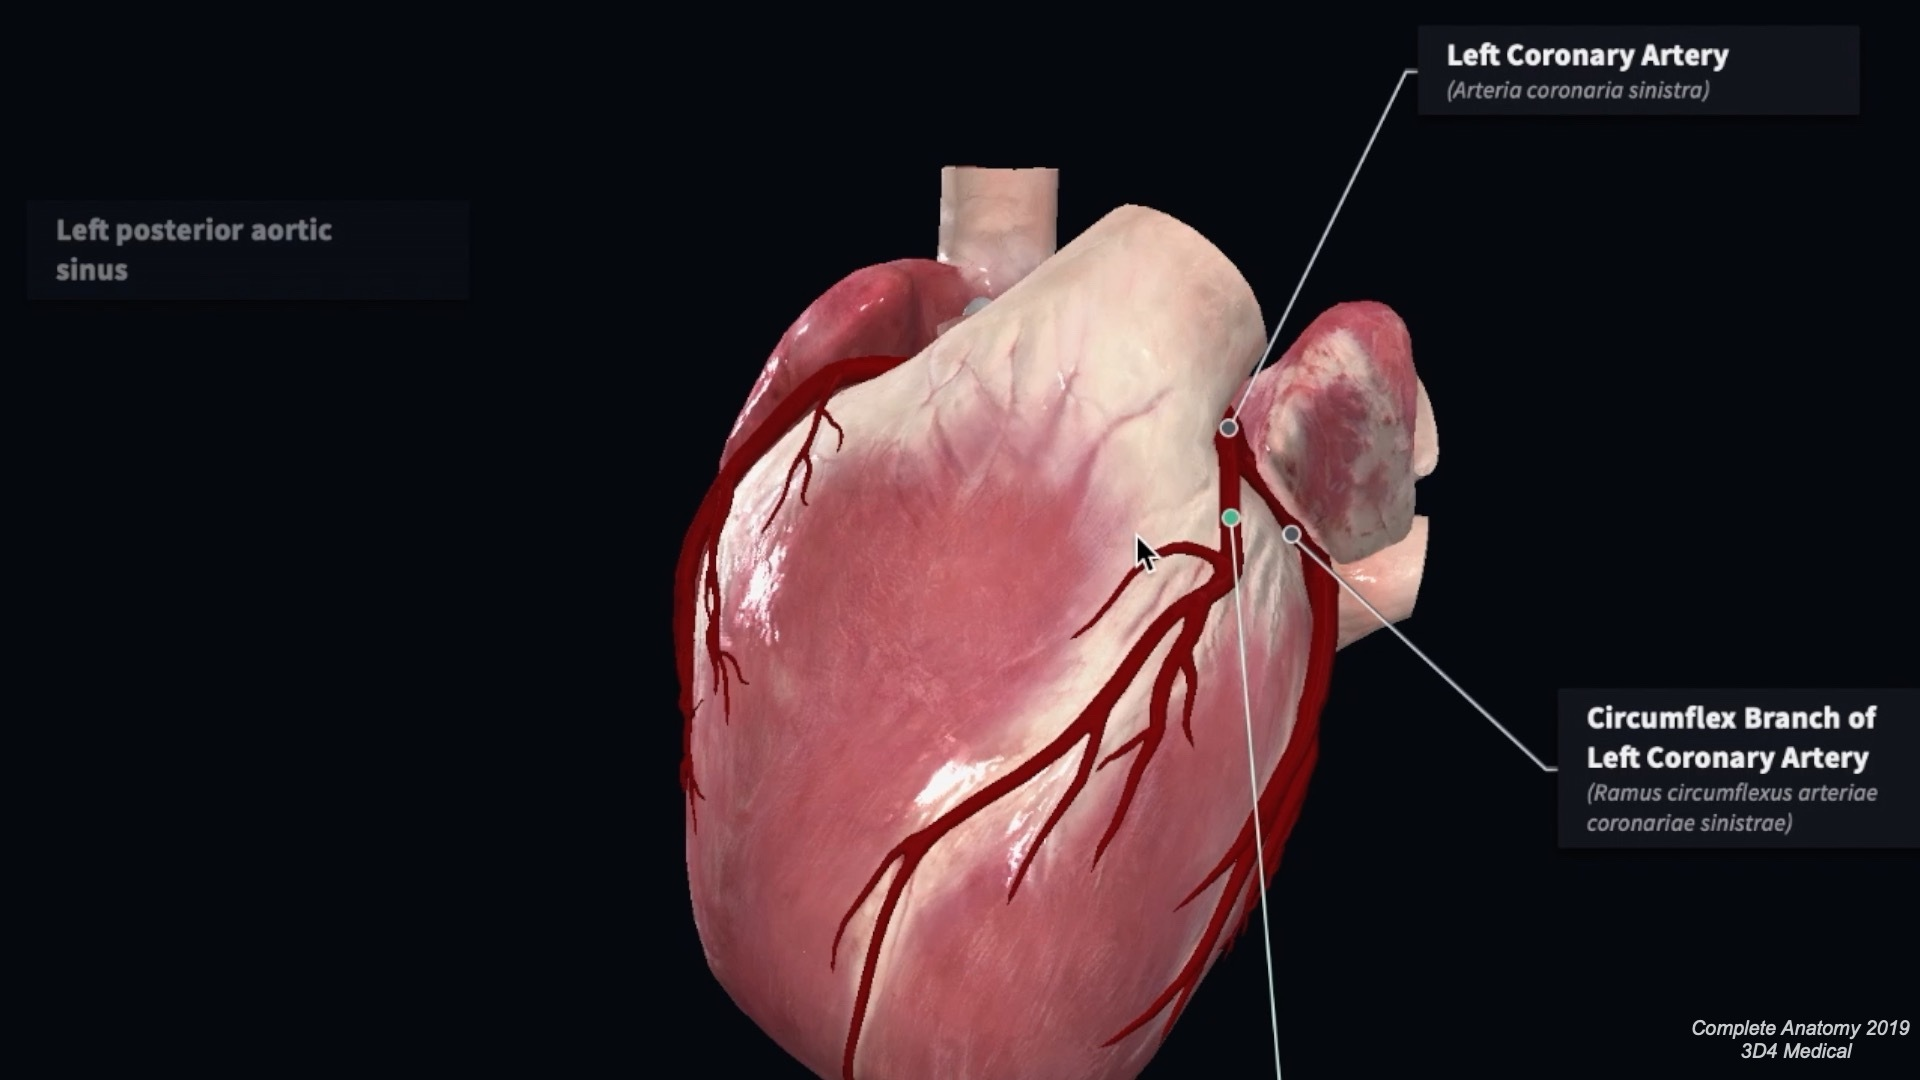 Coronary Artery Anatomy Blood Supply To The Heart Geeky Medics